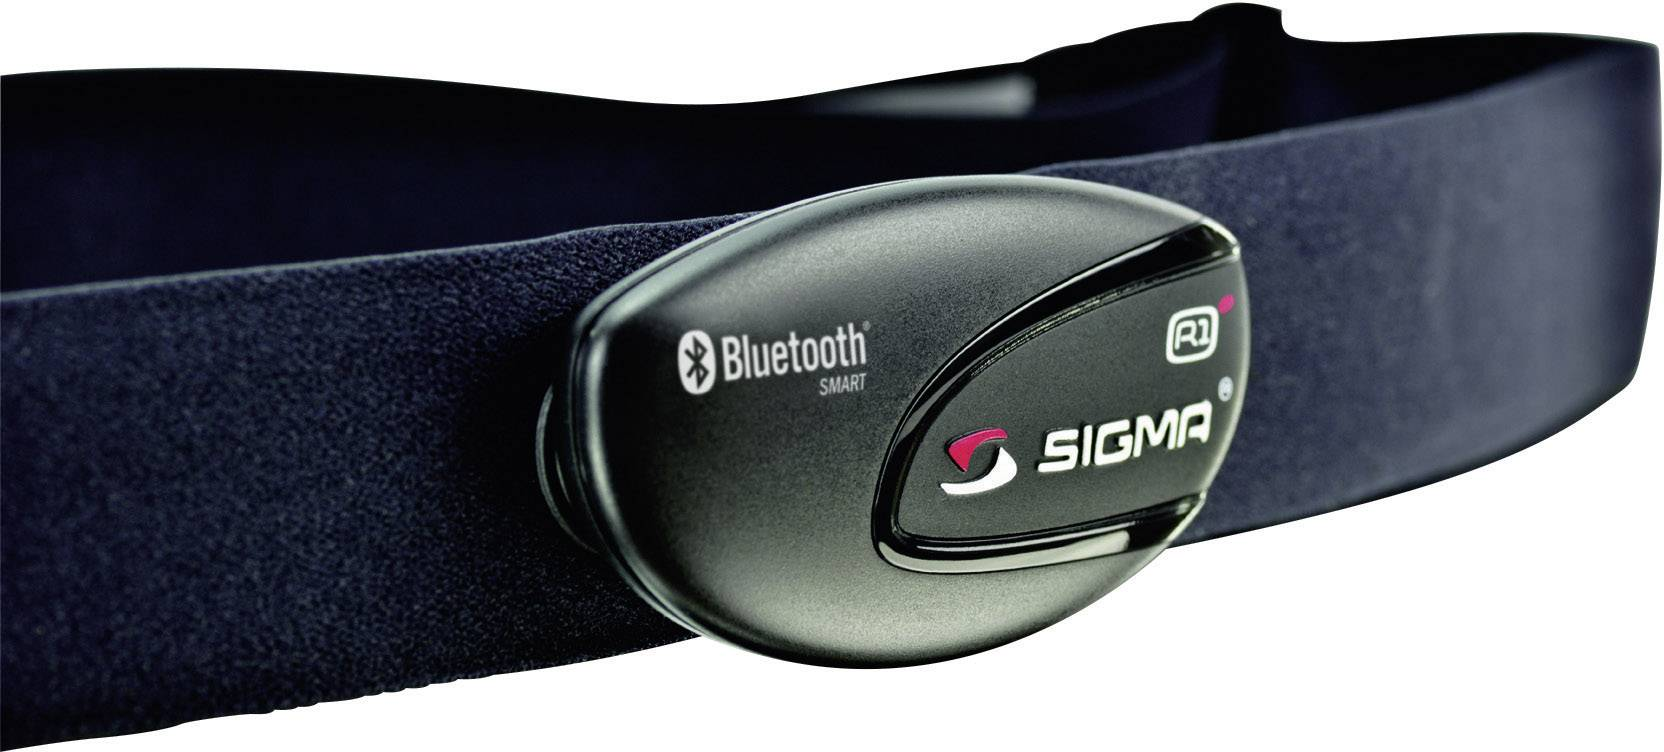 Hrudný pás Sigma R1 Blue 20328, Bluetooth